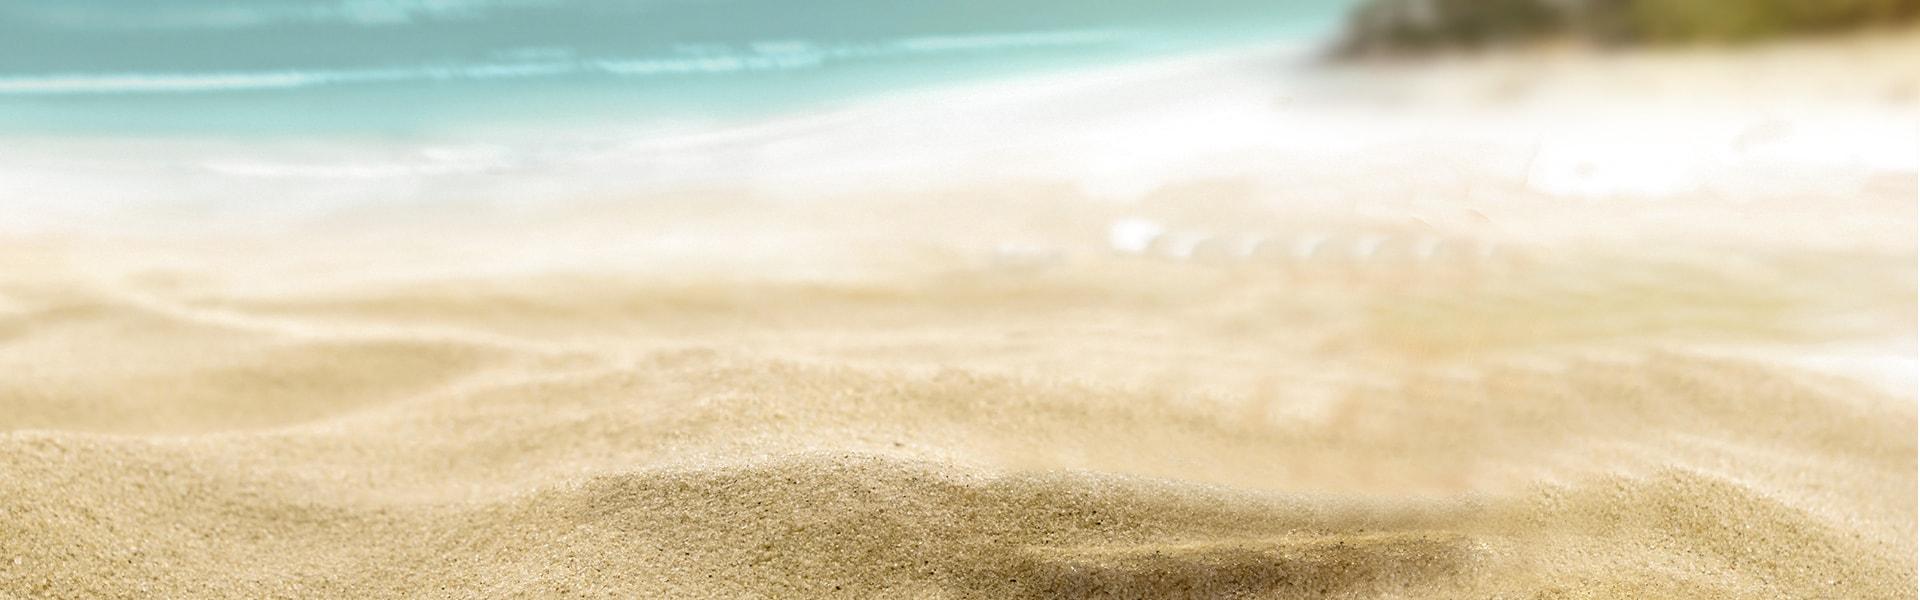 sea-background